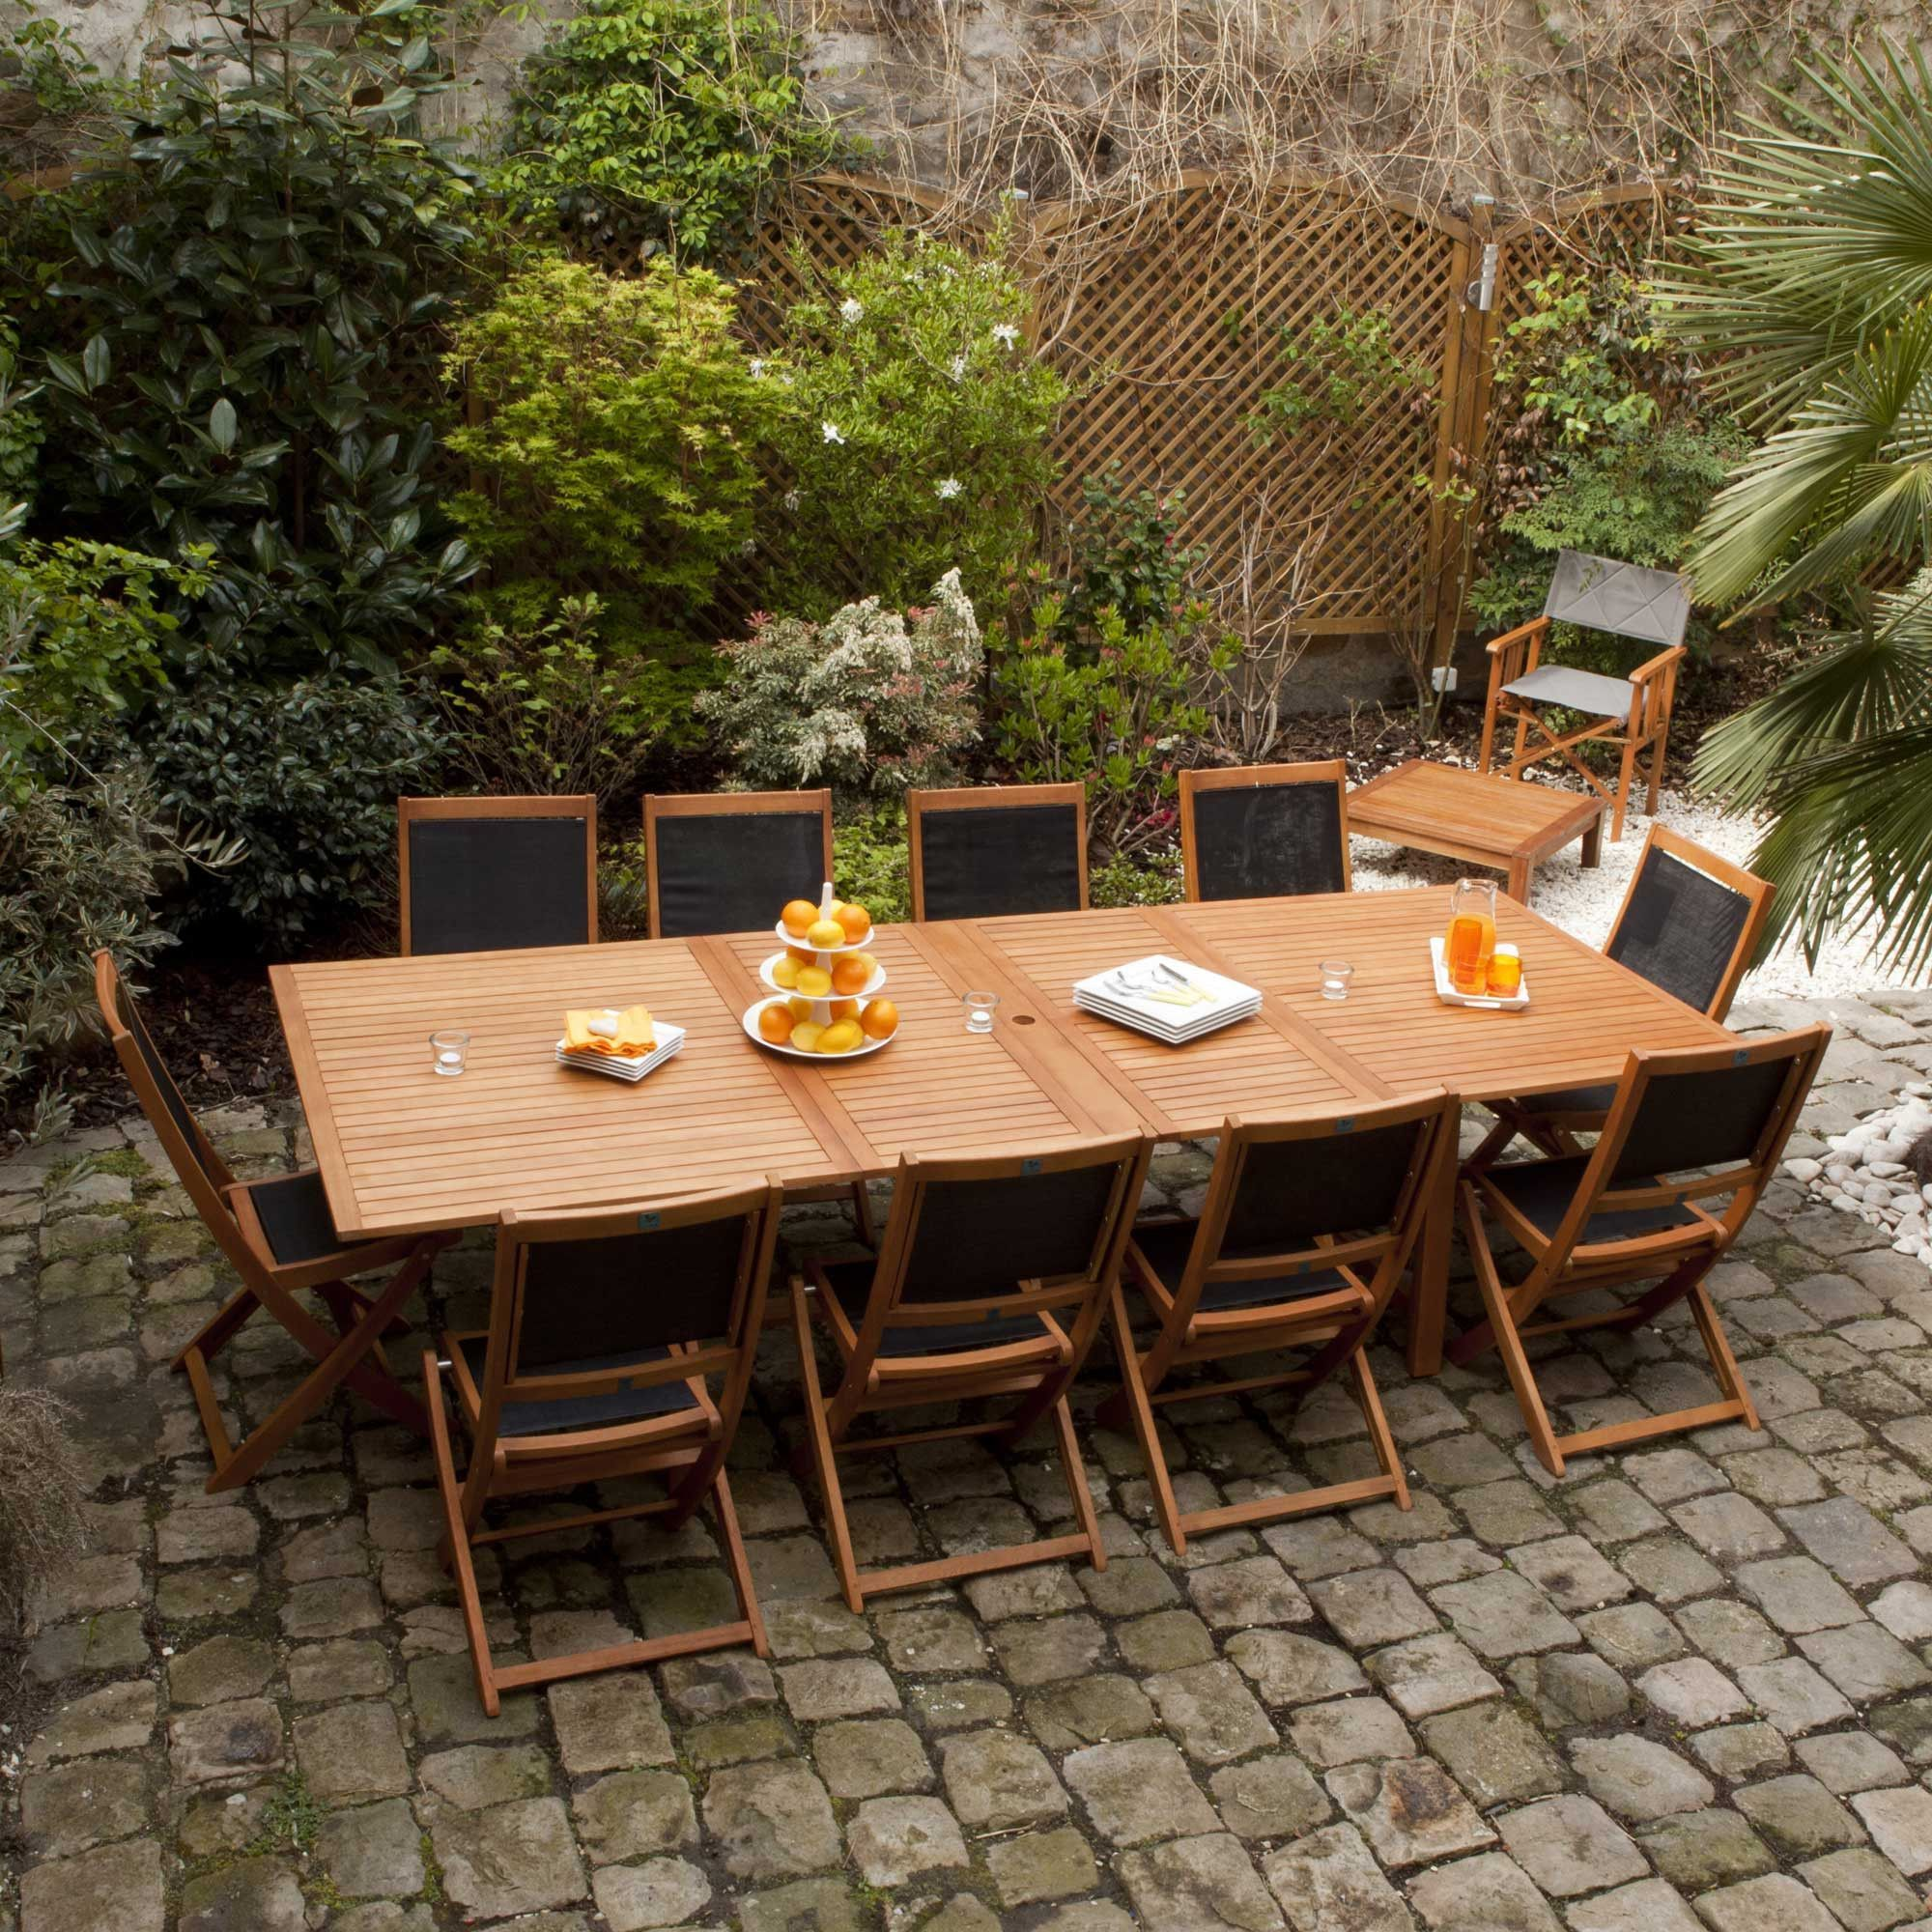 Achat Salon De Jardin Resine Tressee Table Et Chaises De Jardin Table Jardin Plastique Chaise De Jardin